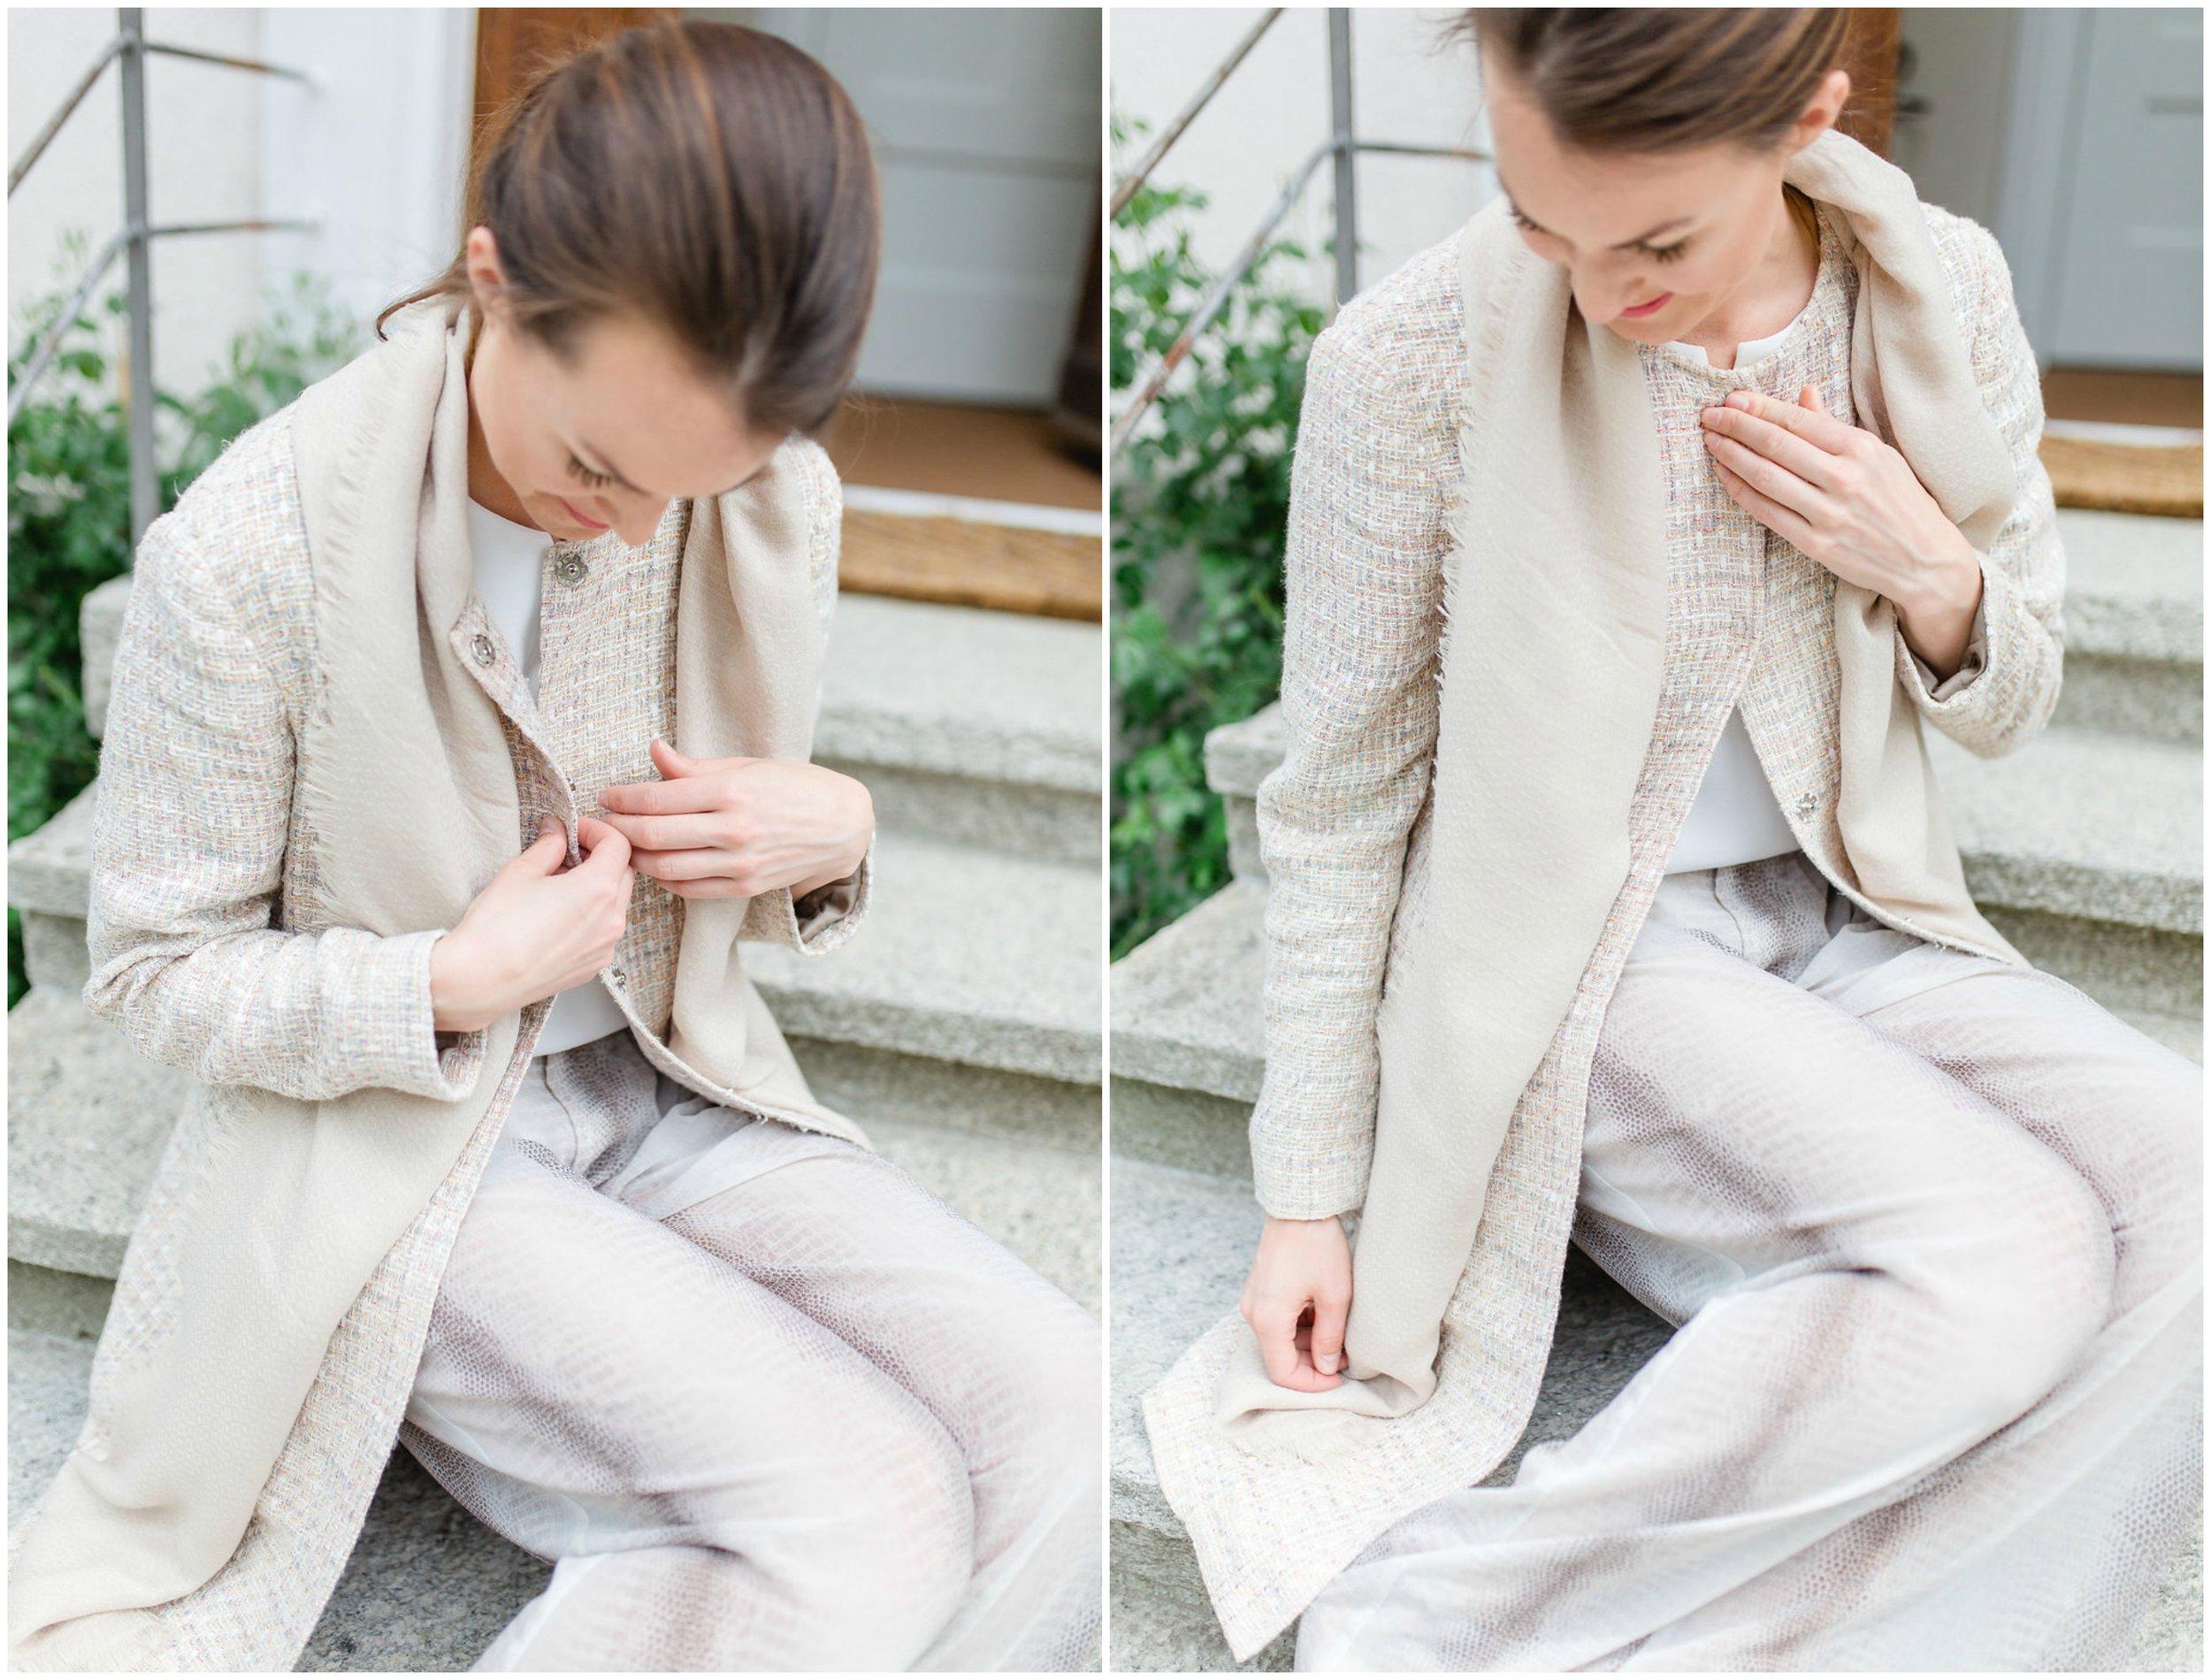 Sofia CM Interior Swedish fashion and style Blog Zurich - How to dress scandinavian